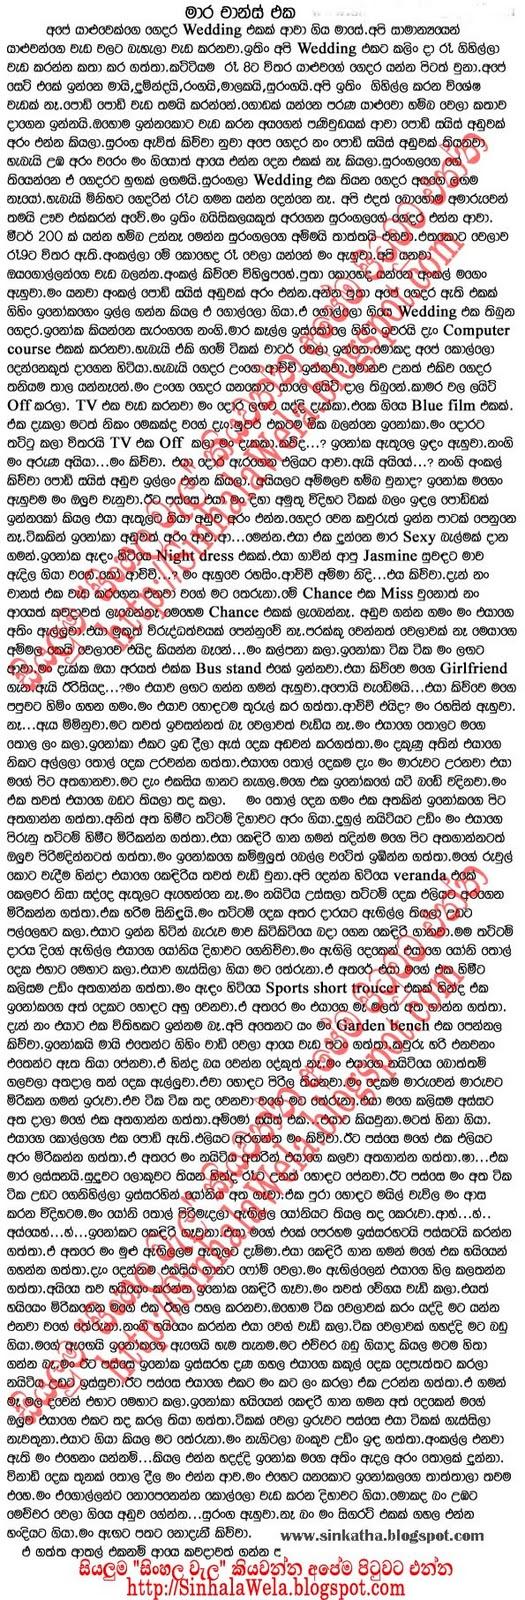 Sinhala wal sex http genuardis net sinhala sinhala wal katha aluth